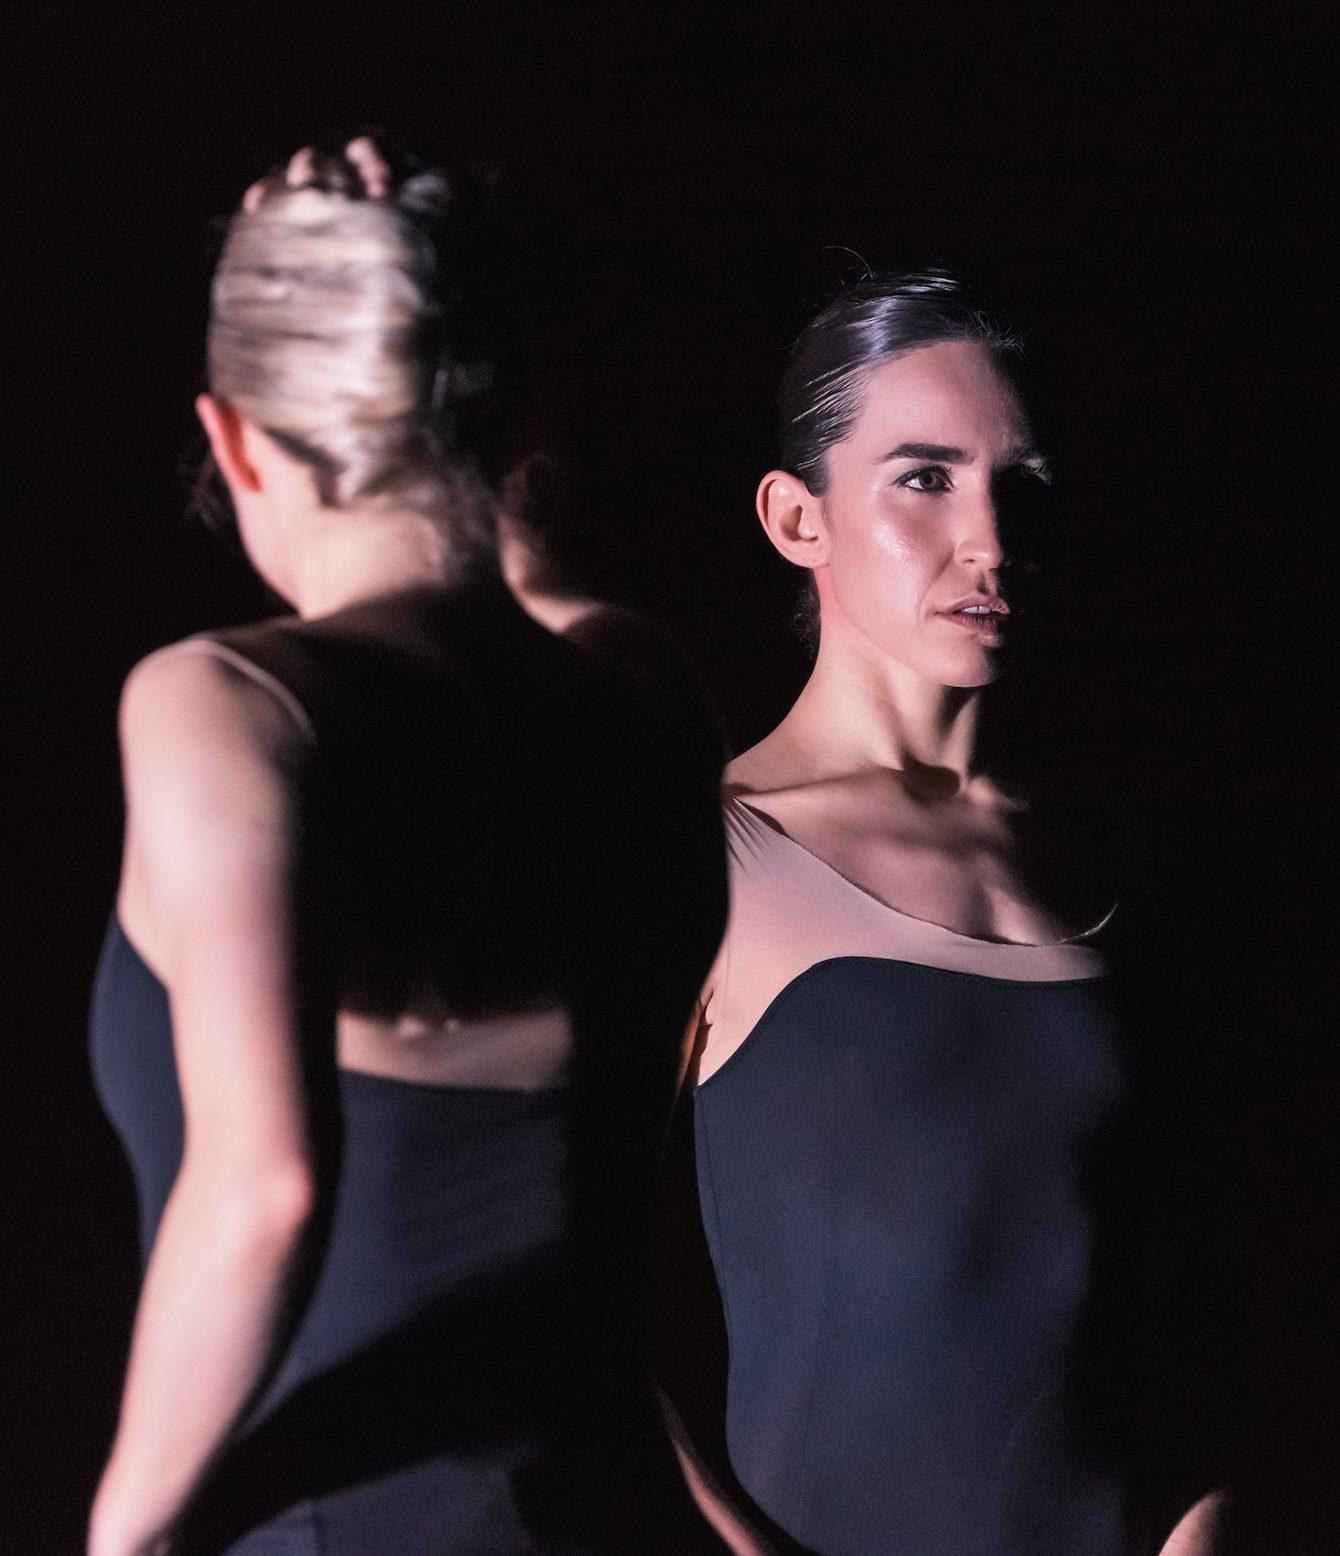 Two dancers in black bodysuits on dark stage.